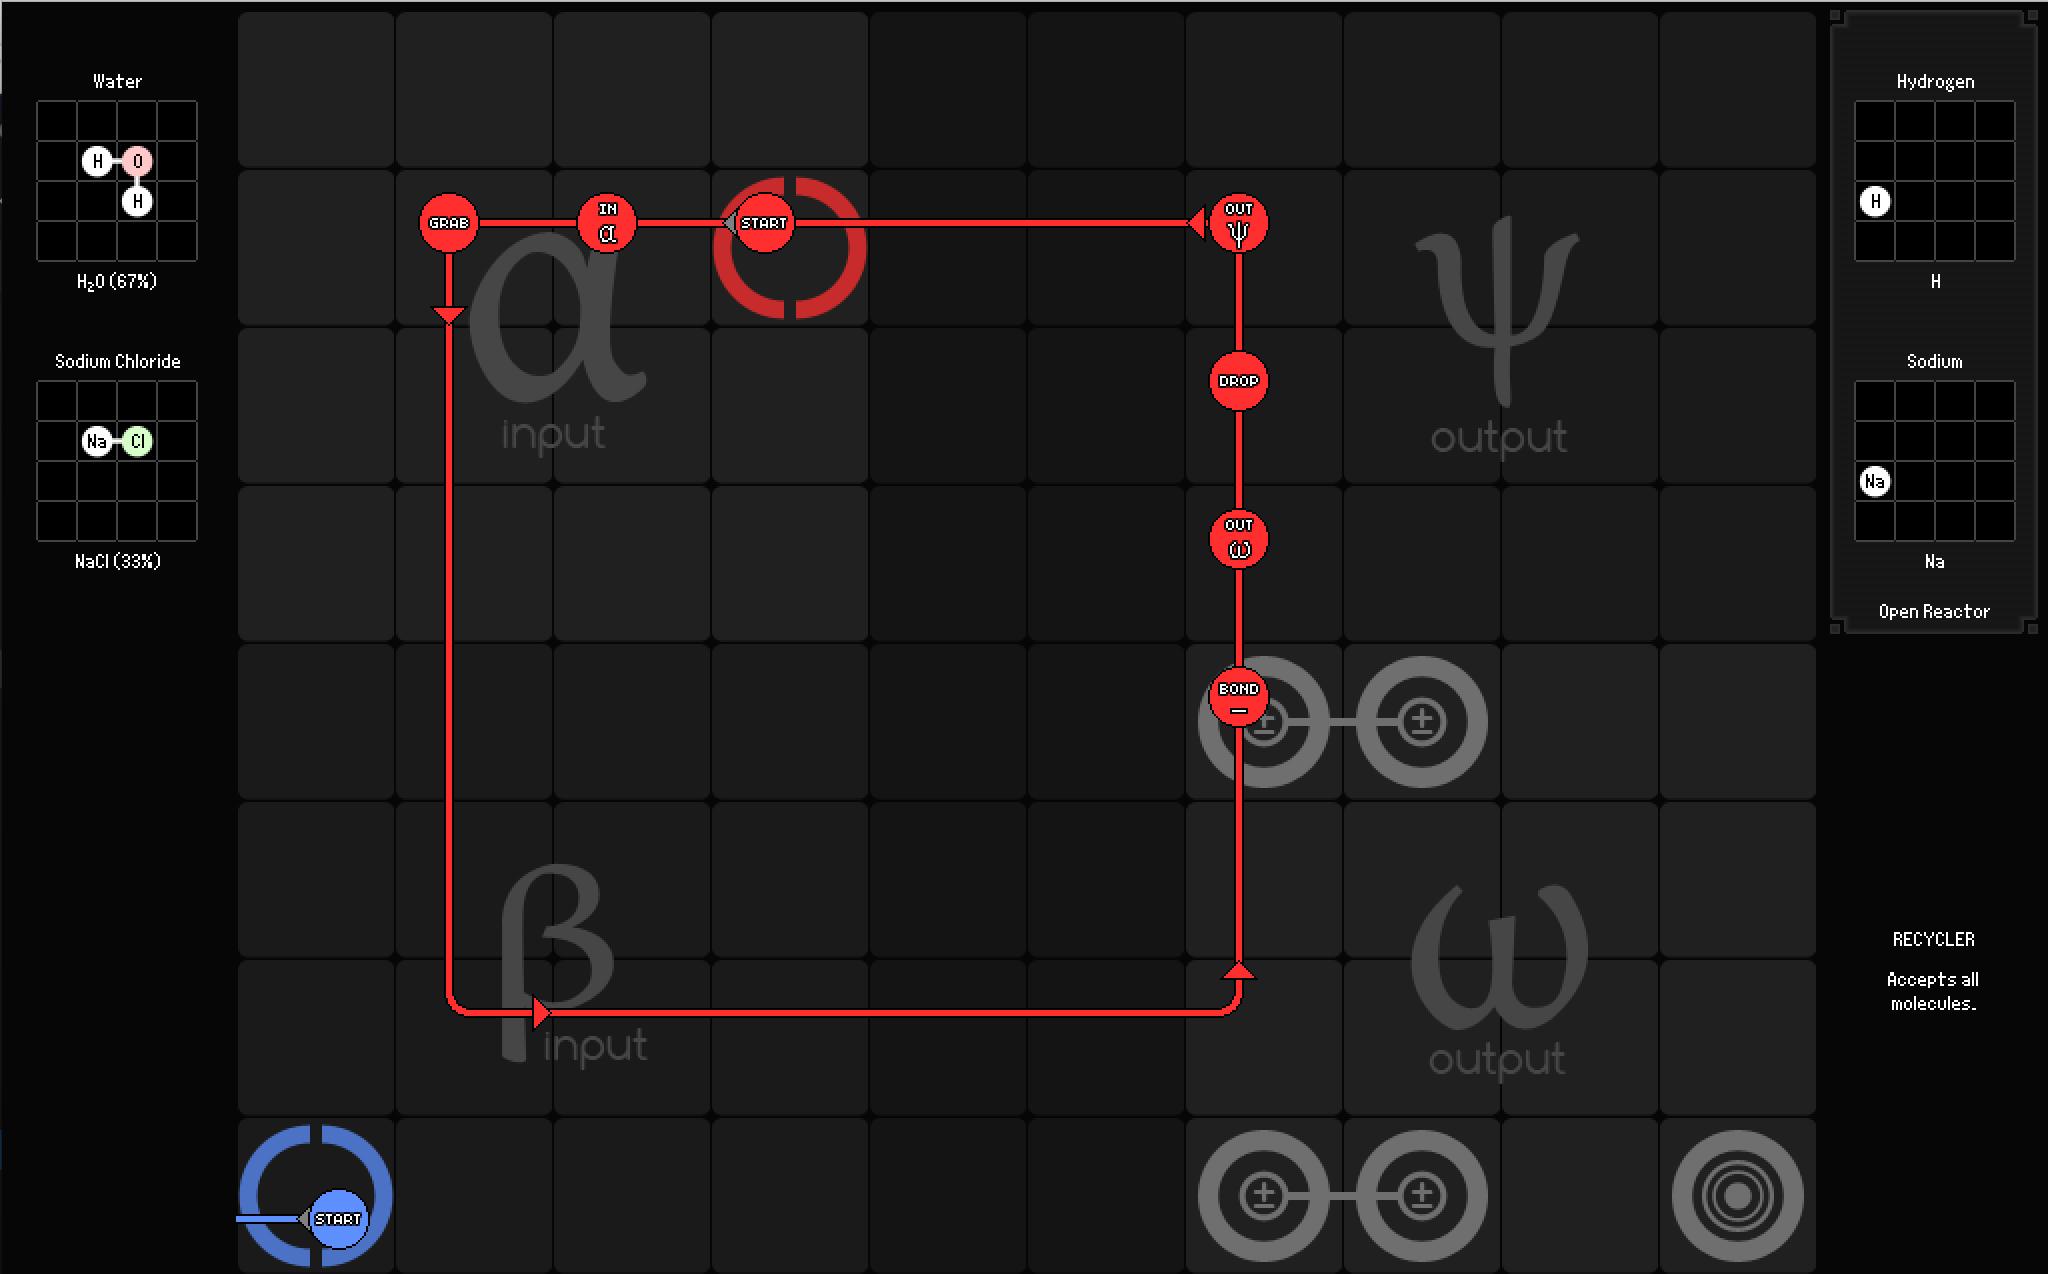 1_Story_Mode/4_Alkonost/SpaceChem-4.5.a/Reactor_3.png